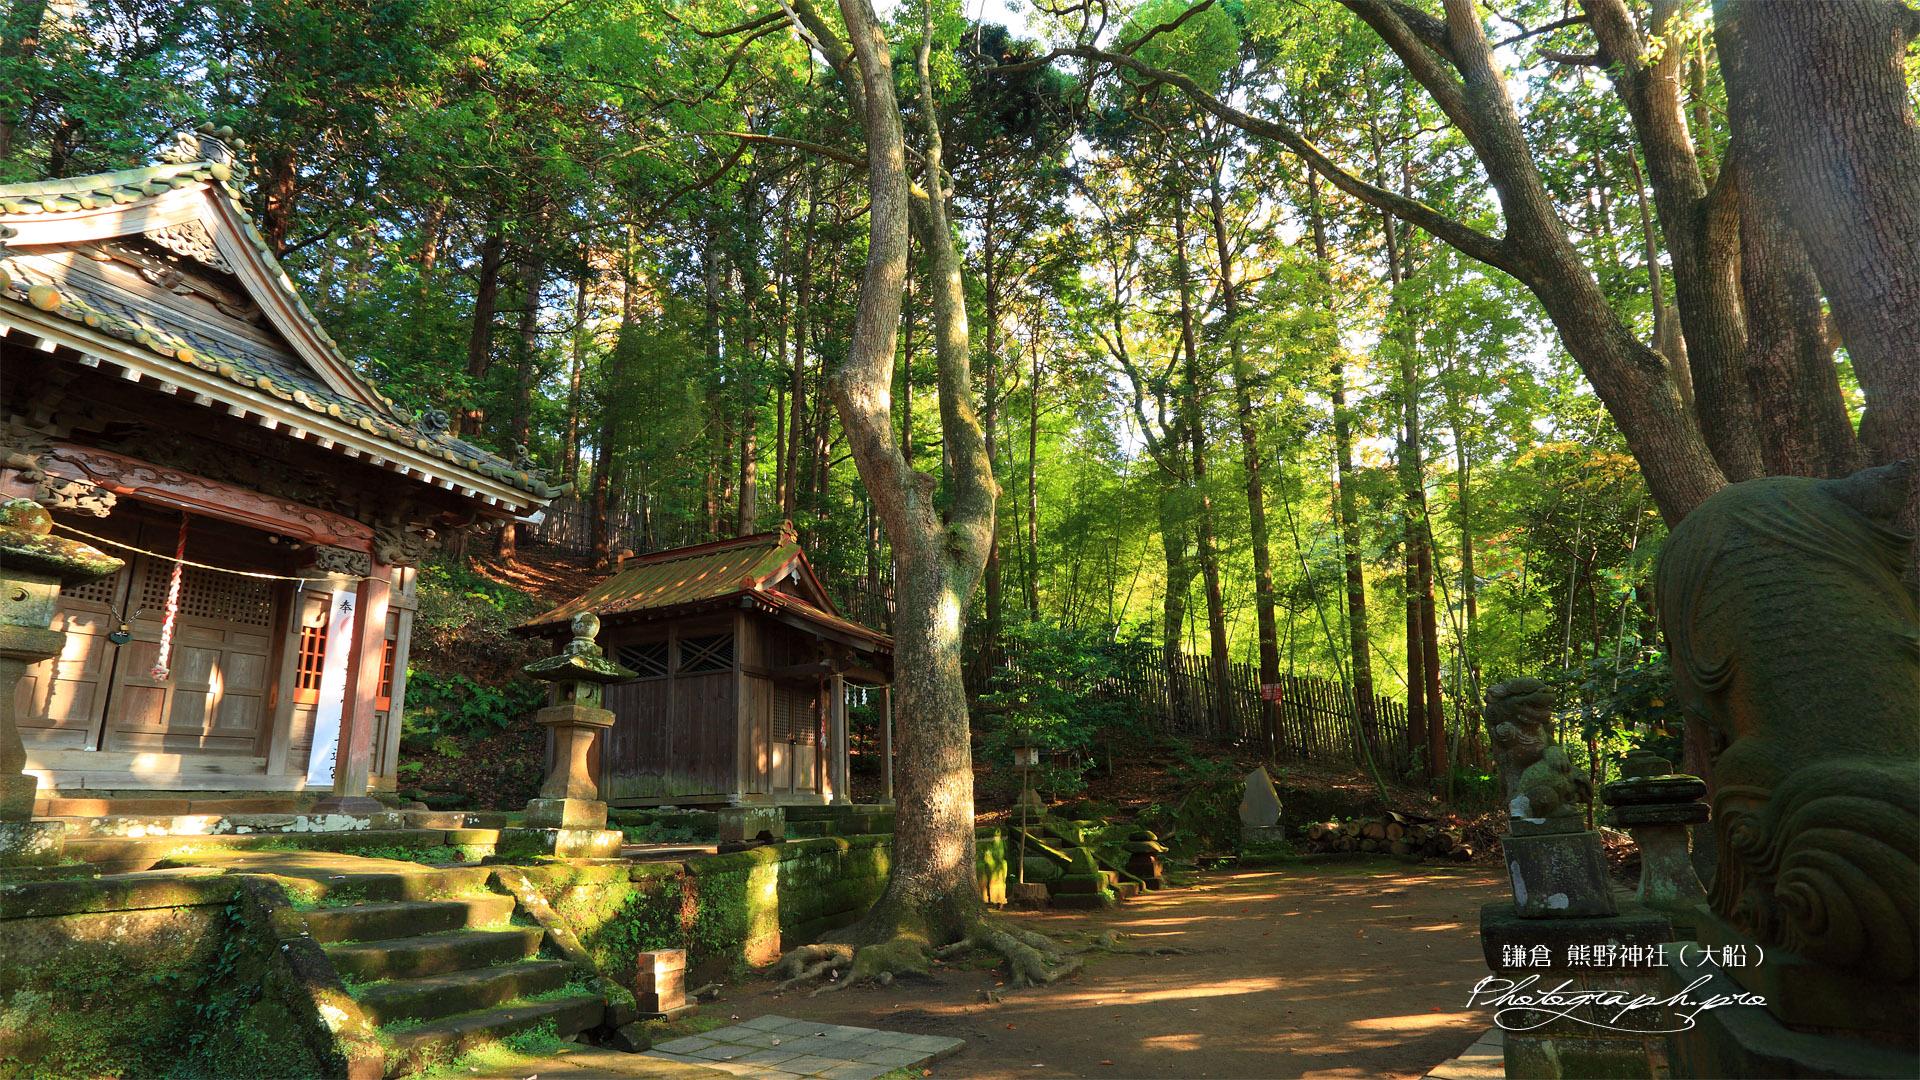 熊野神社(大船) 本殿と末社